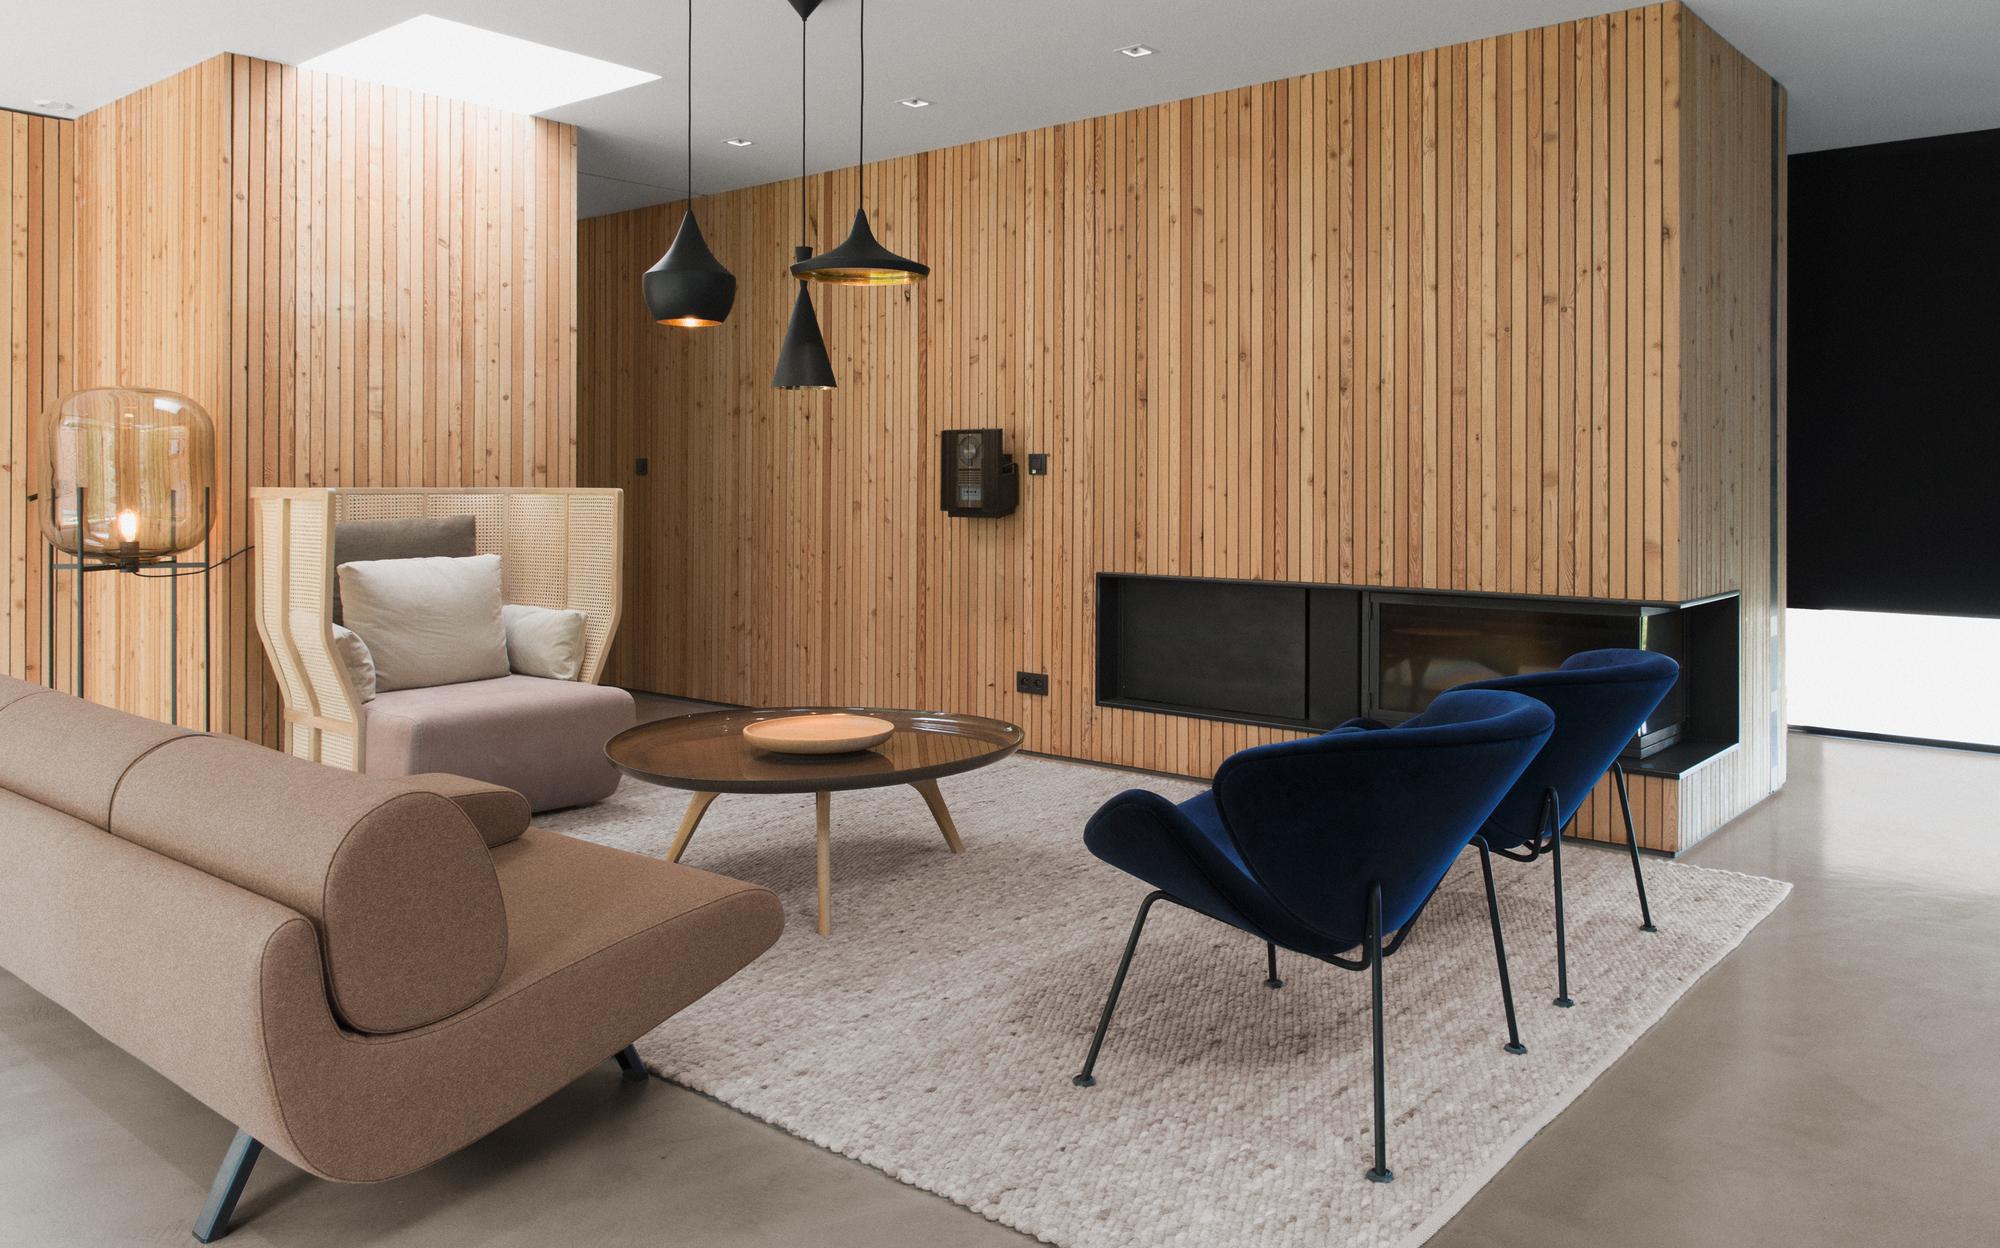 gallery of la maison etir e barres coquet 5. Black Bedroom Furniture Sets. Home Design Ideas